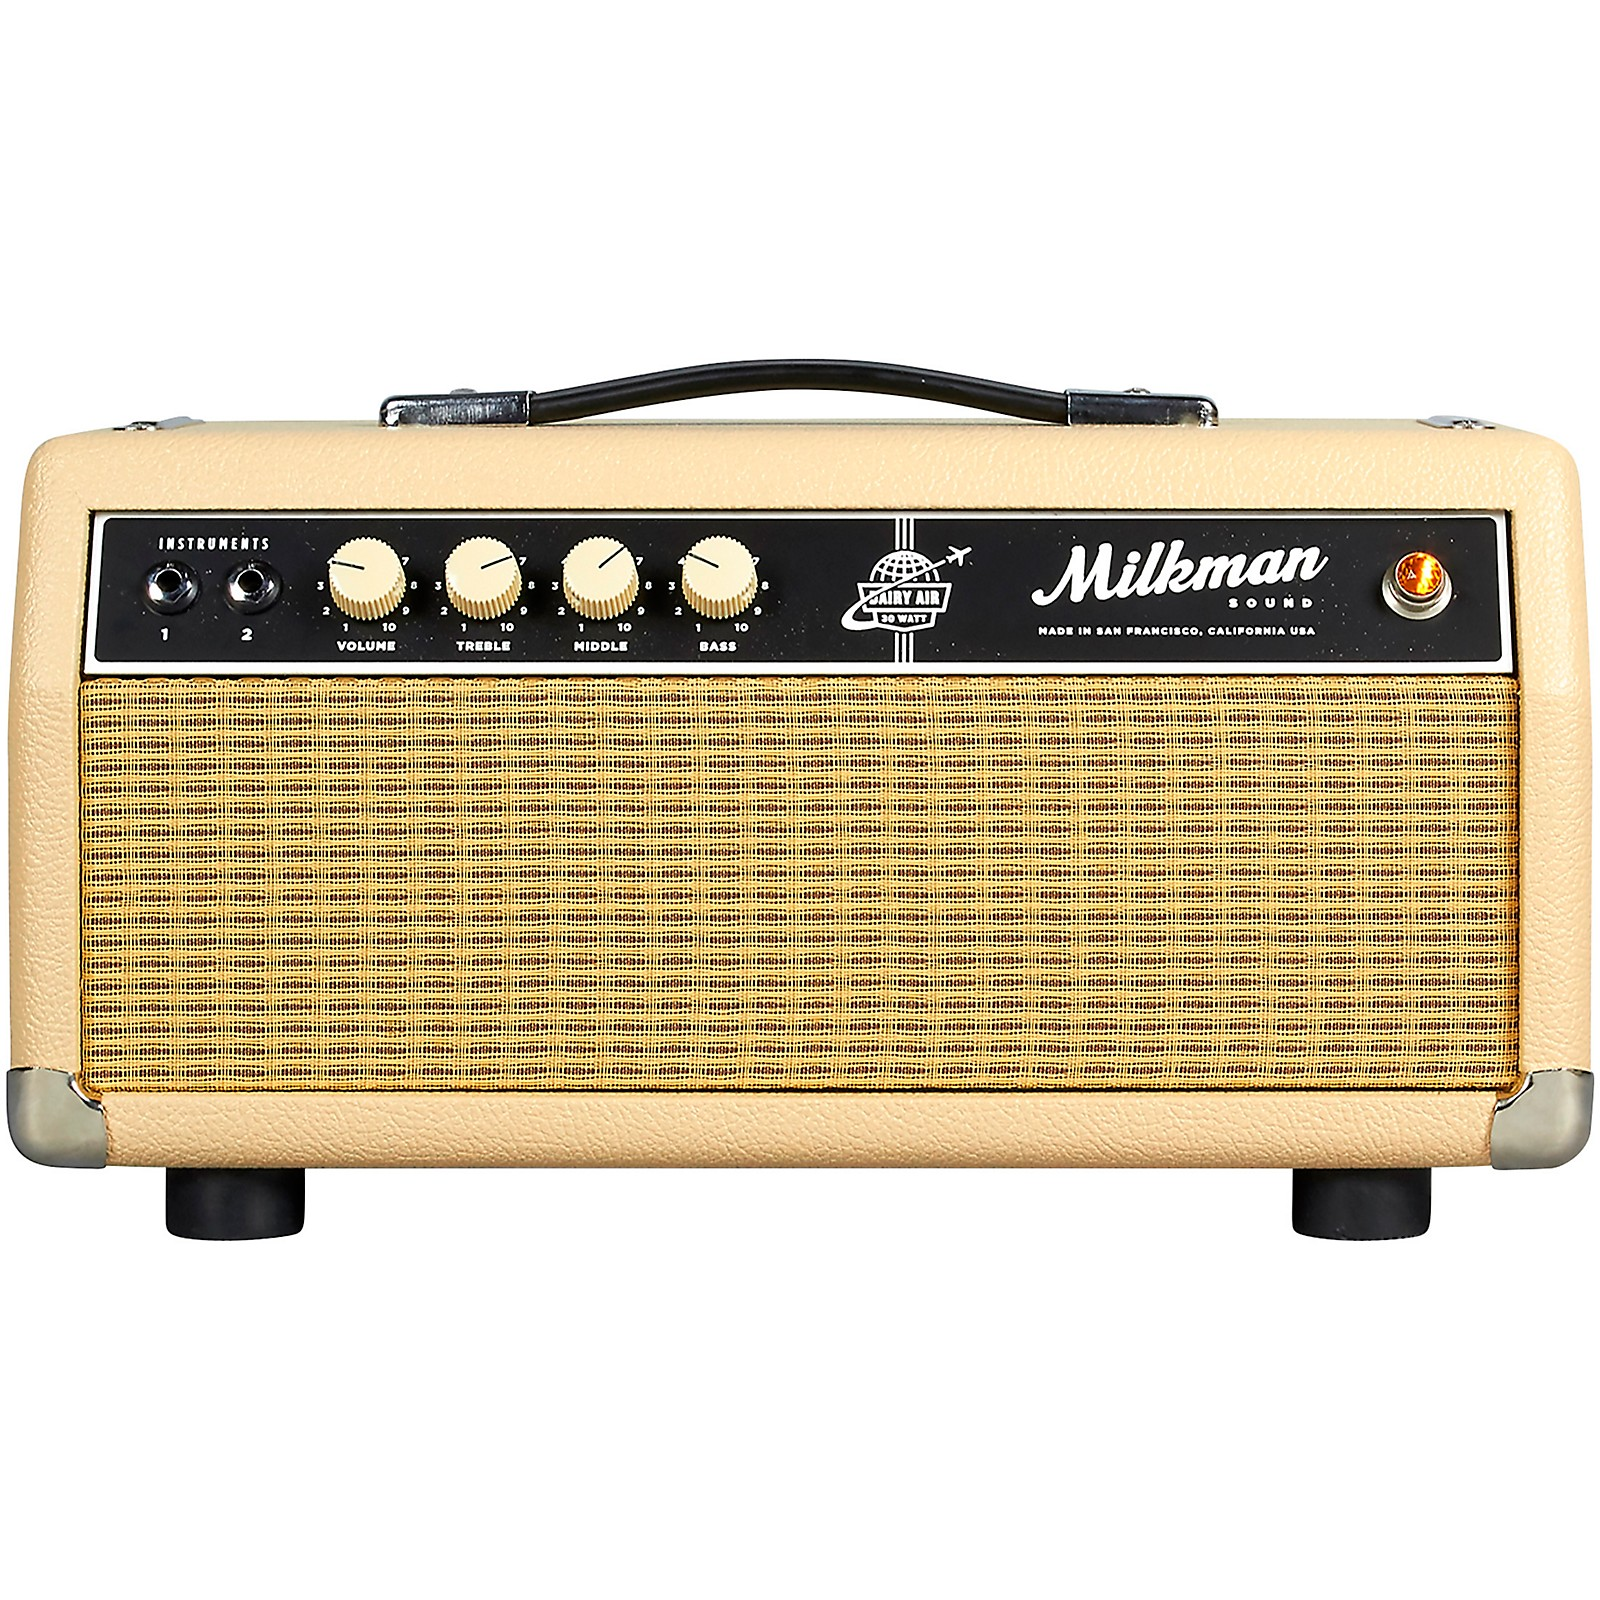 Milkman Sound 30W Dairy Air 30W Tube Guitar Amp Head